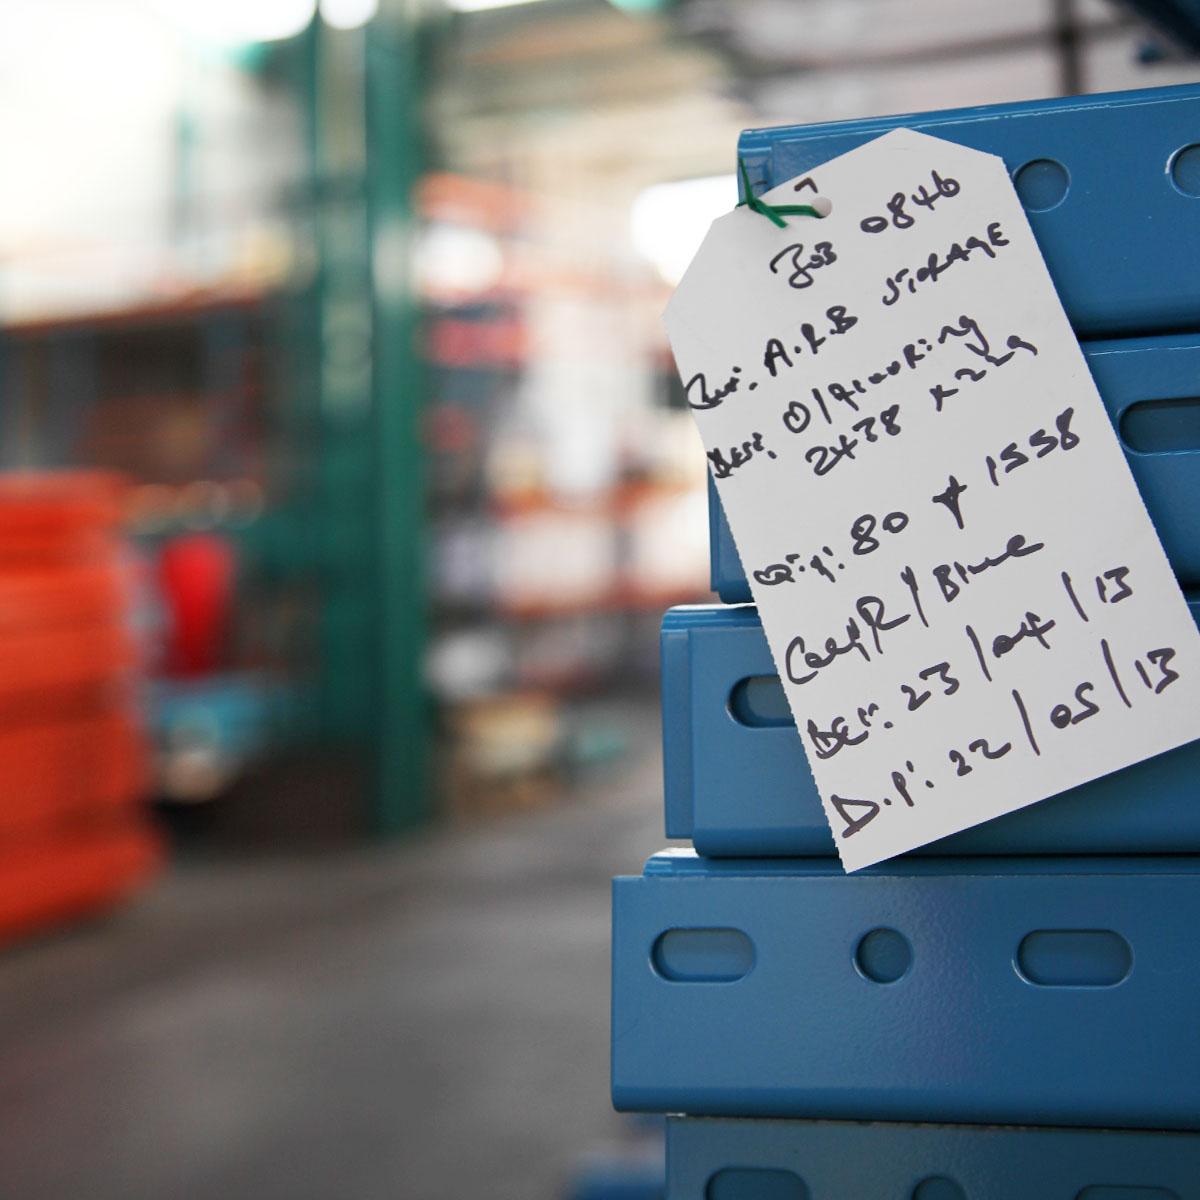 Storelab shipment